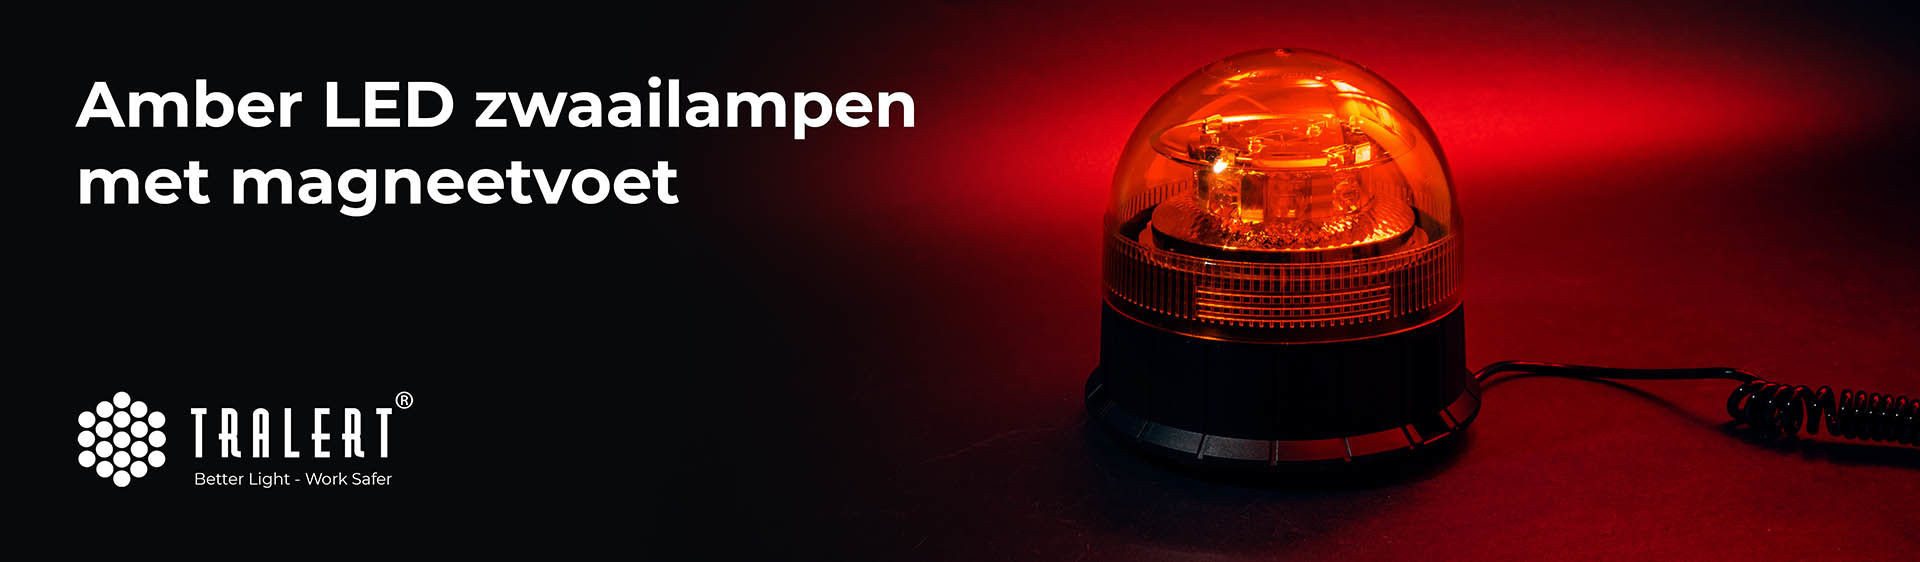 Tralert LED zwaailamp zwaailampen magneetvoet amber banner